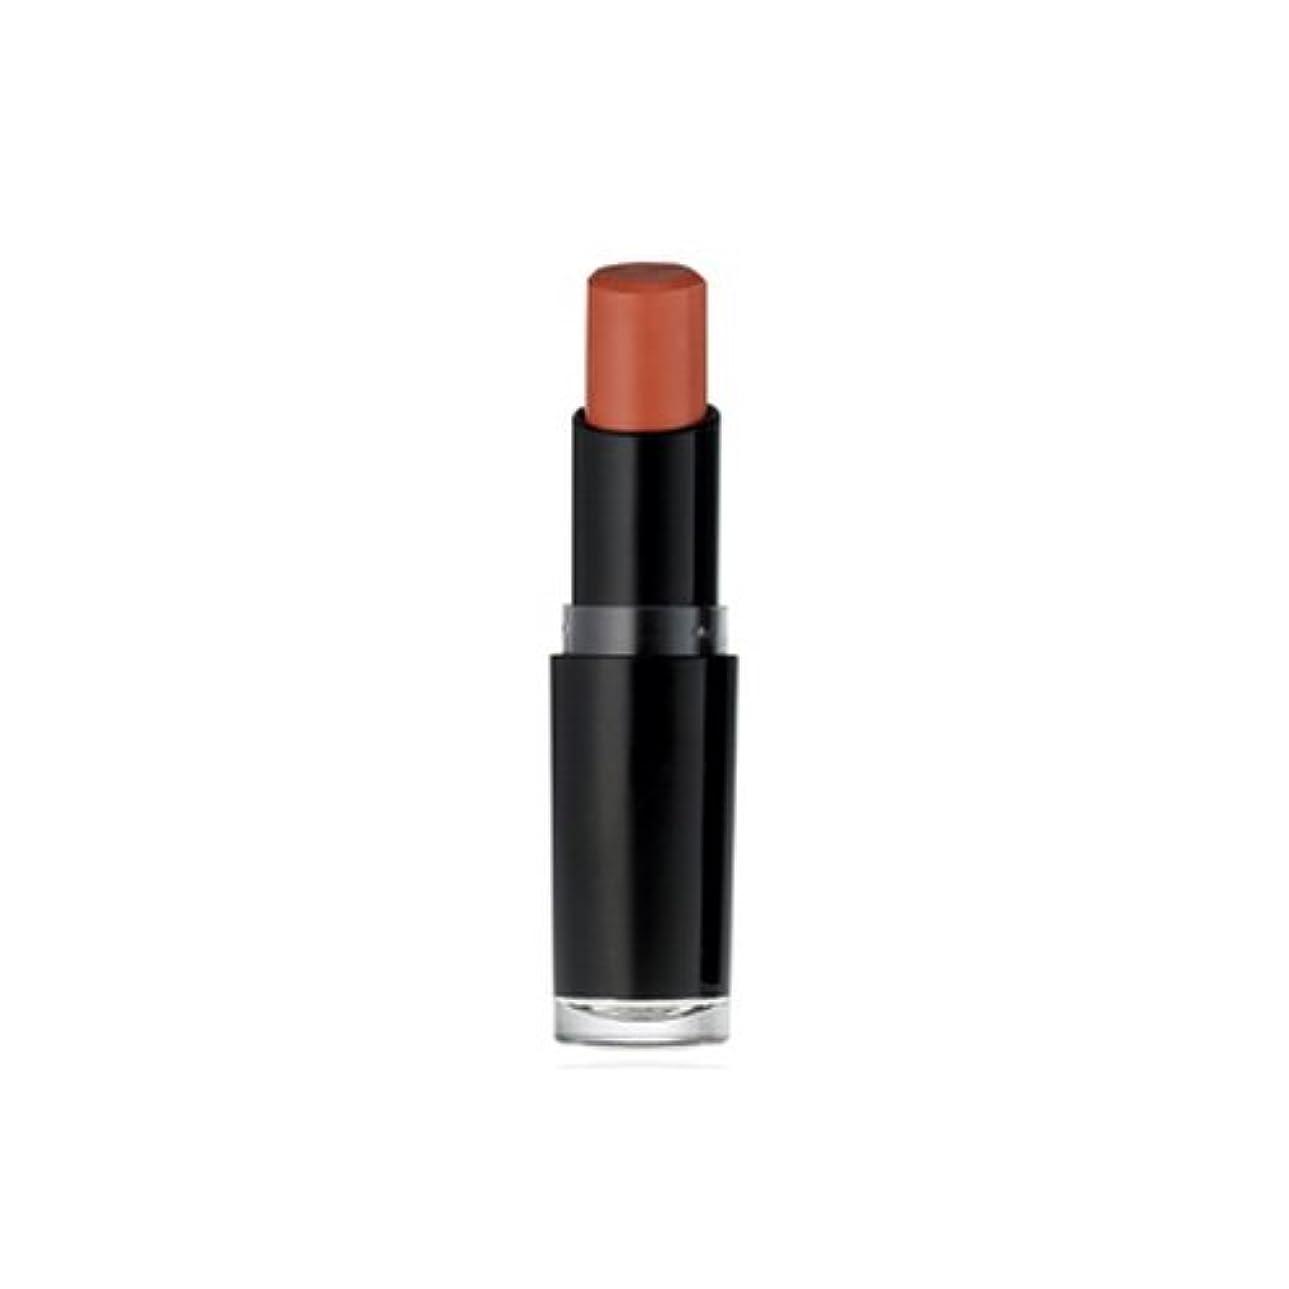 記者責任者風景WET N WILD Mega Last Matte Lip Cover - Just Peachy (並行輸入品)